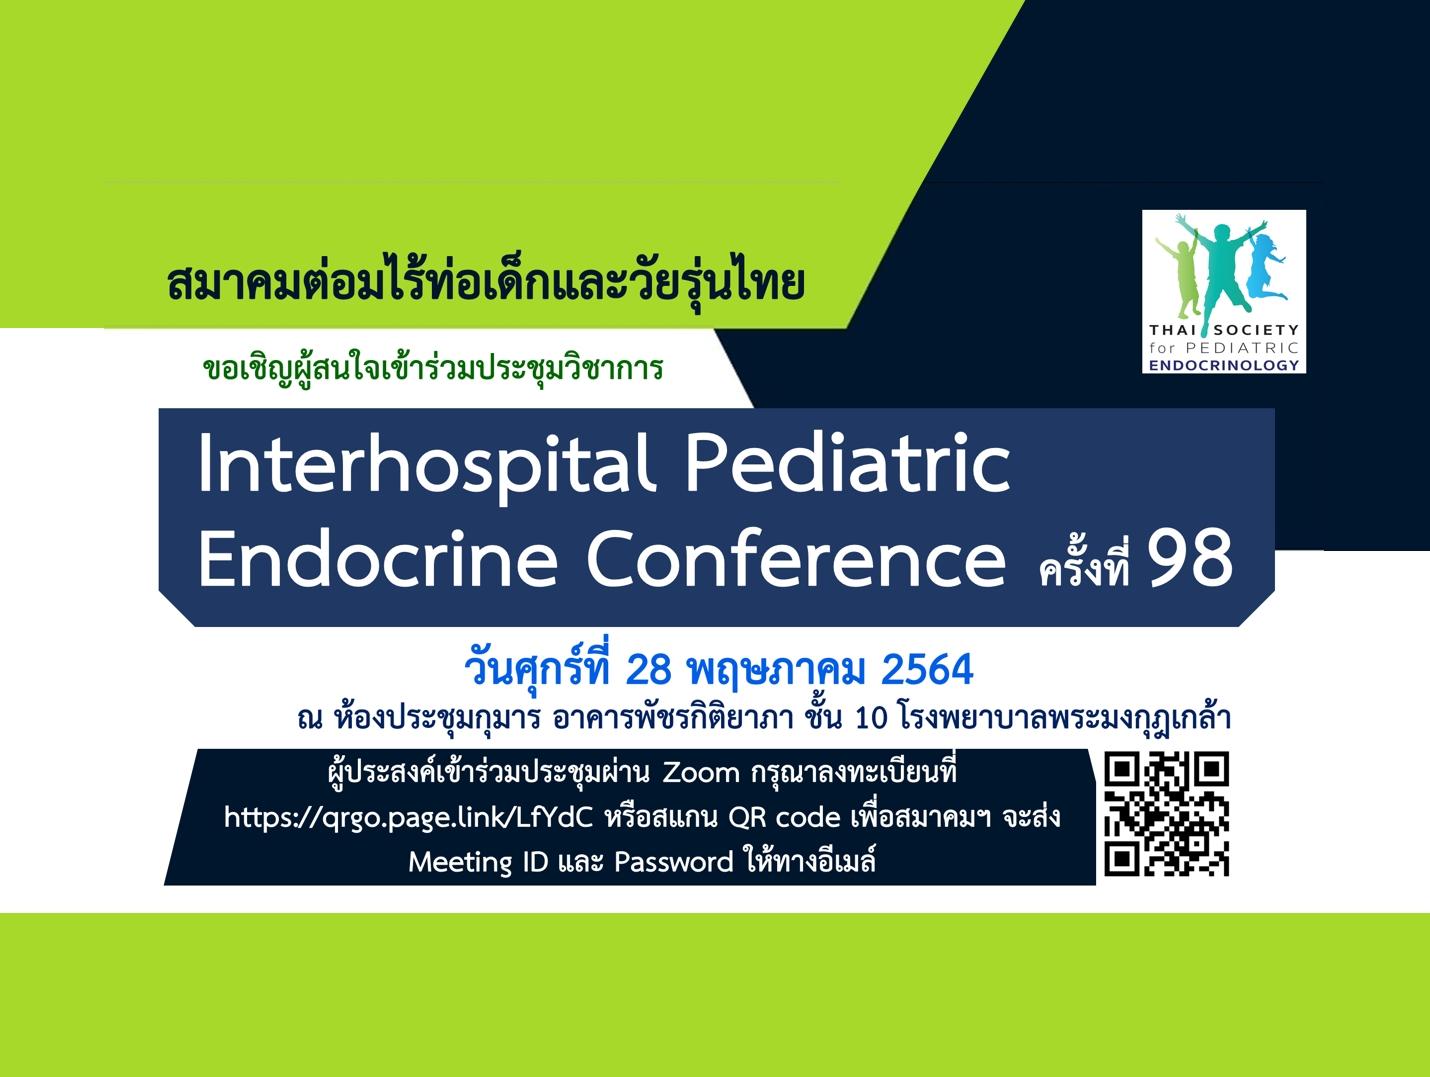 Interhospital Pediatric Endocrine Conference ครั้งที่ 98